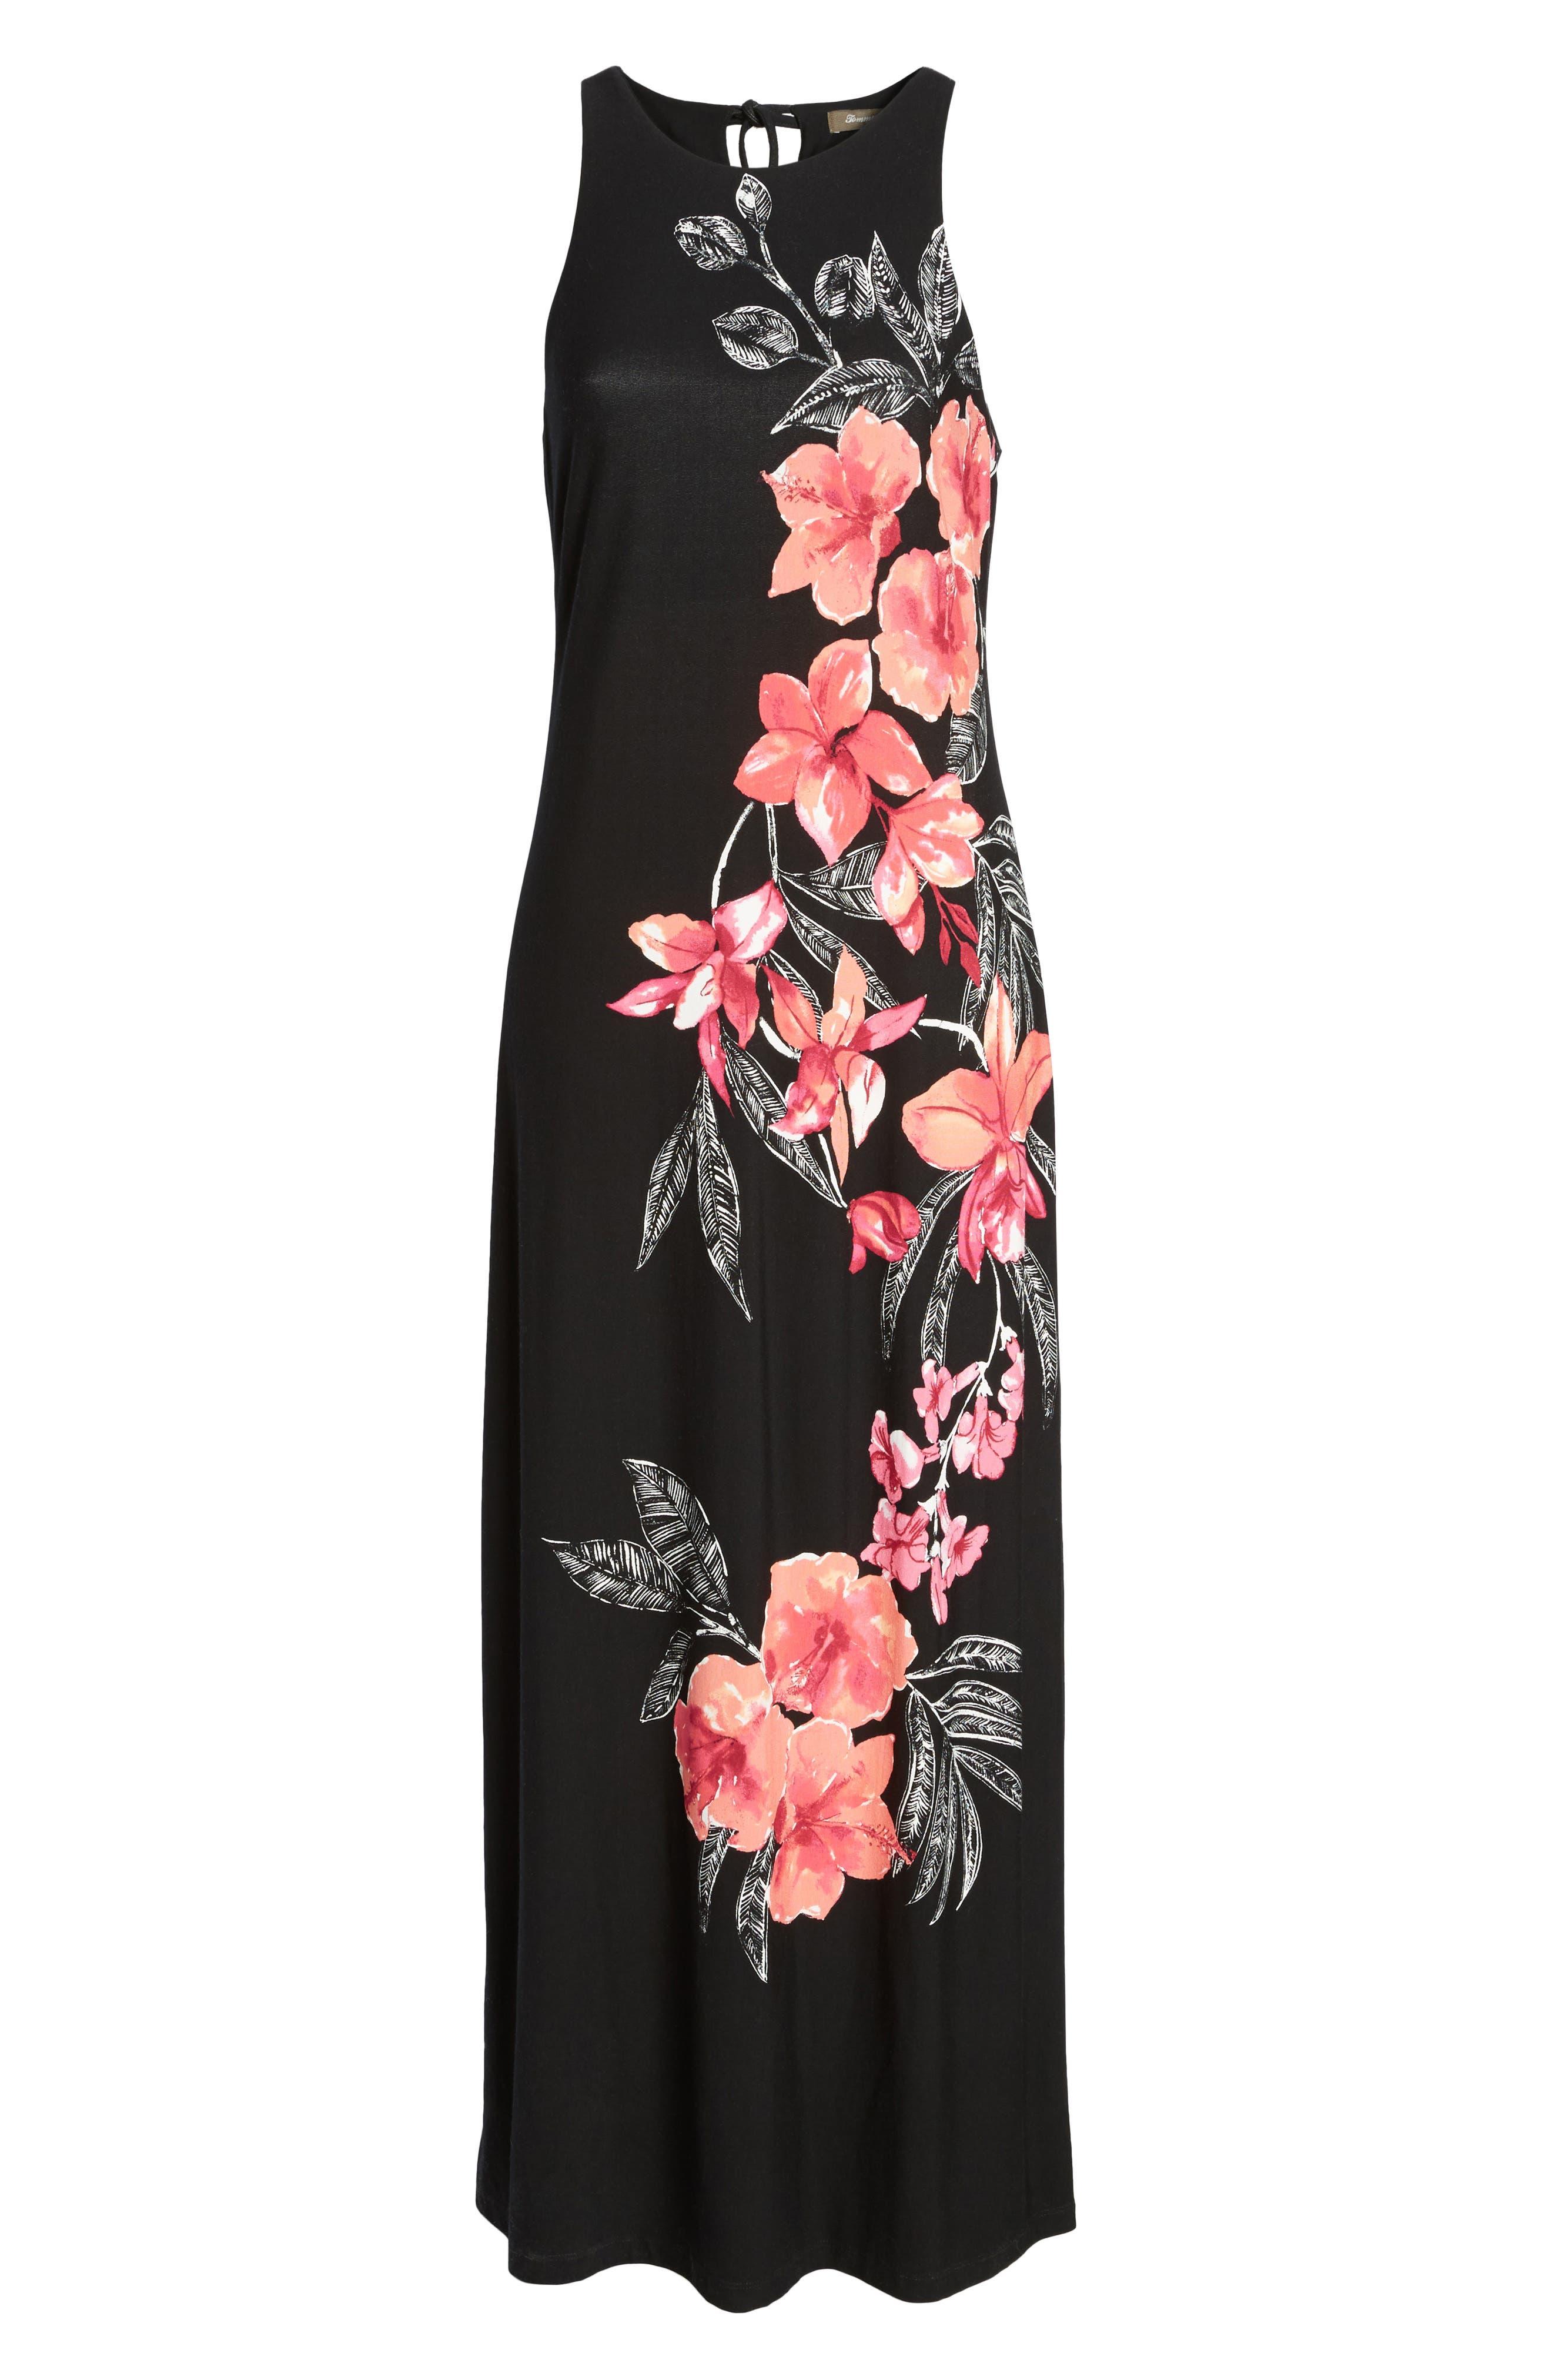 Bedoin Blossoms Maxi Dress,                             Alternate thumbnail 6, color,                             001